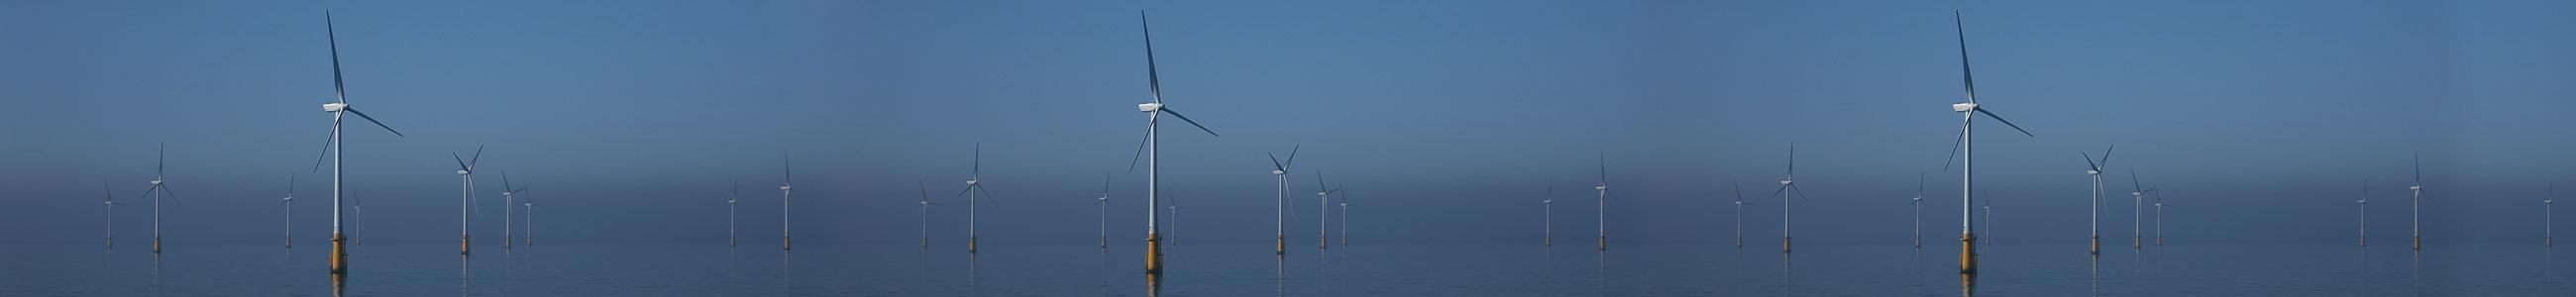 Barrow_Offshore_wind_turbines_NR